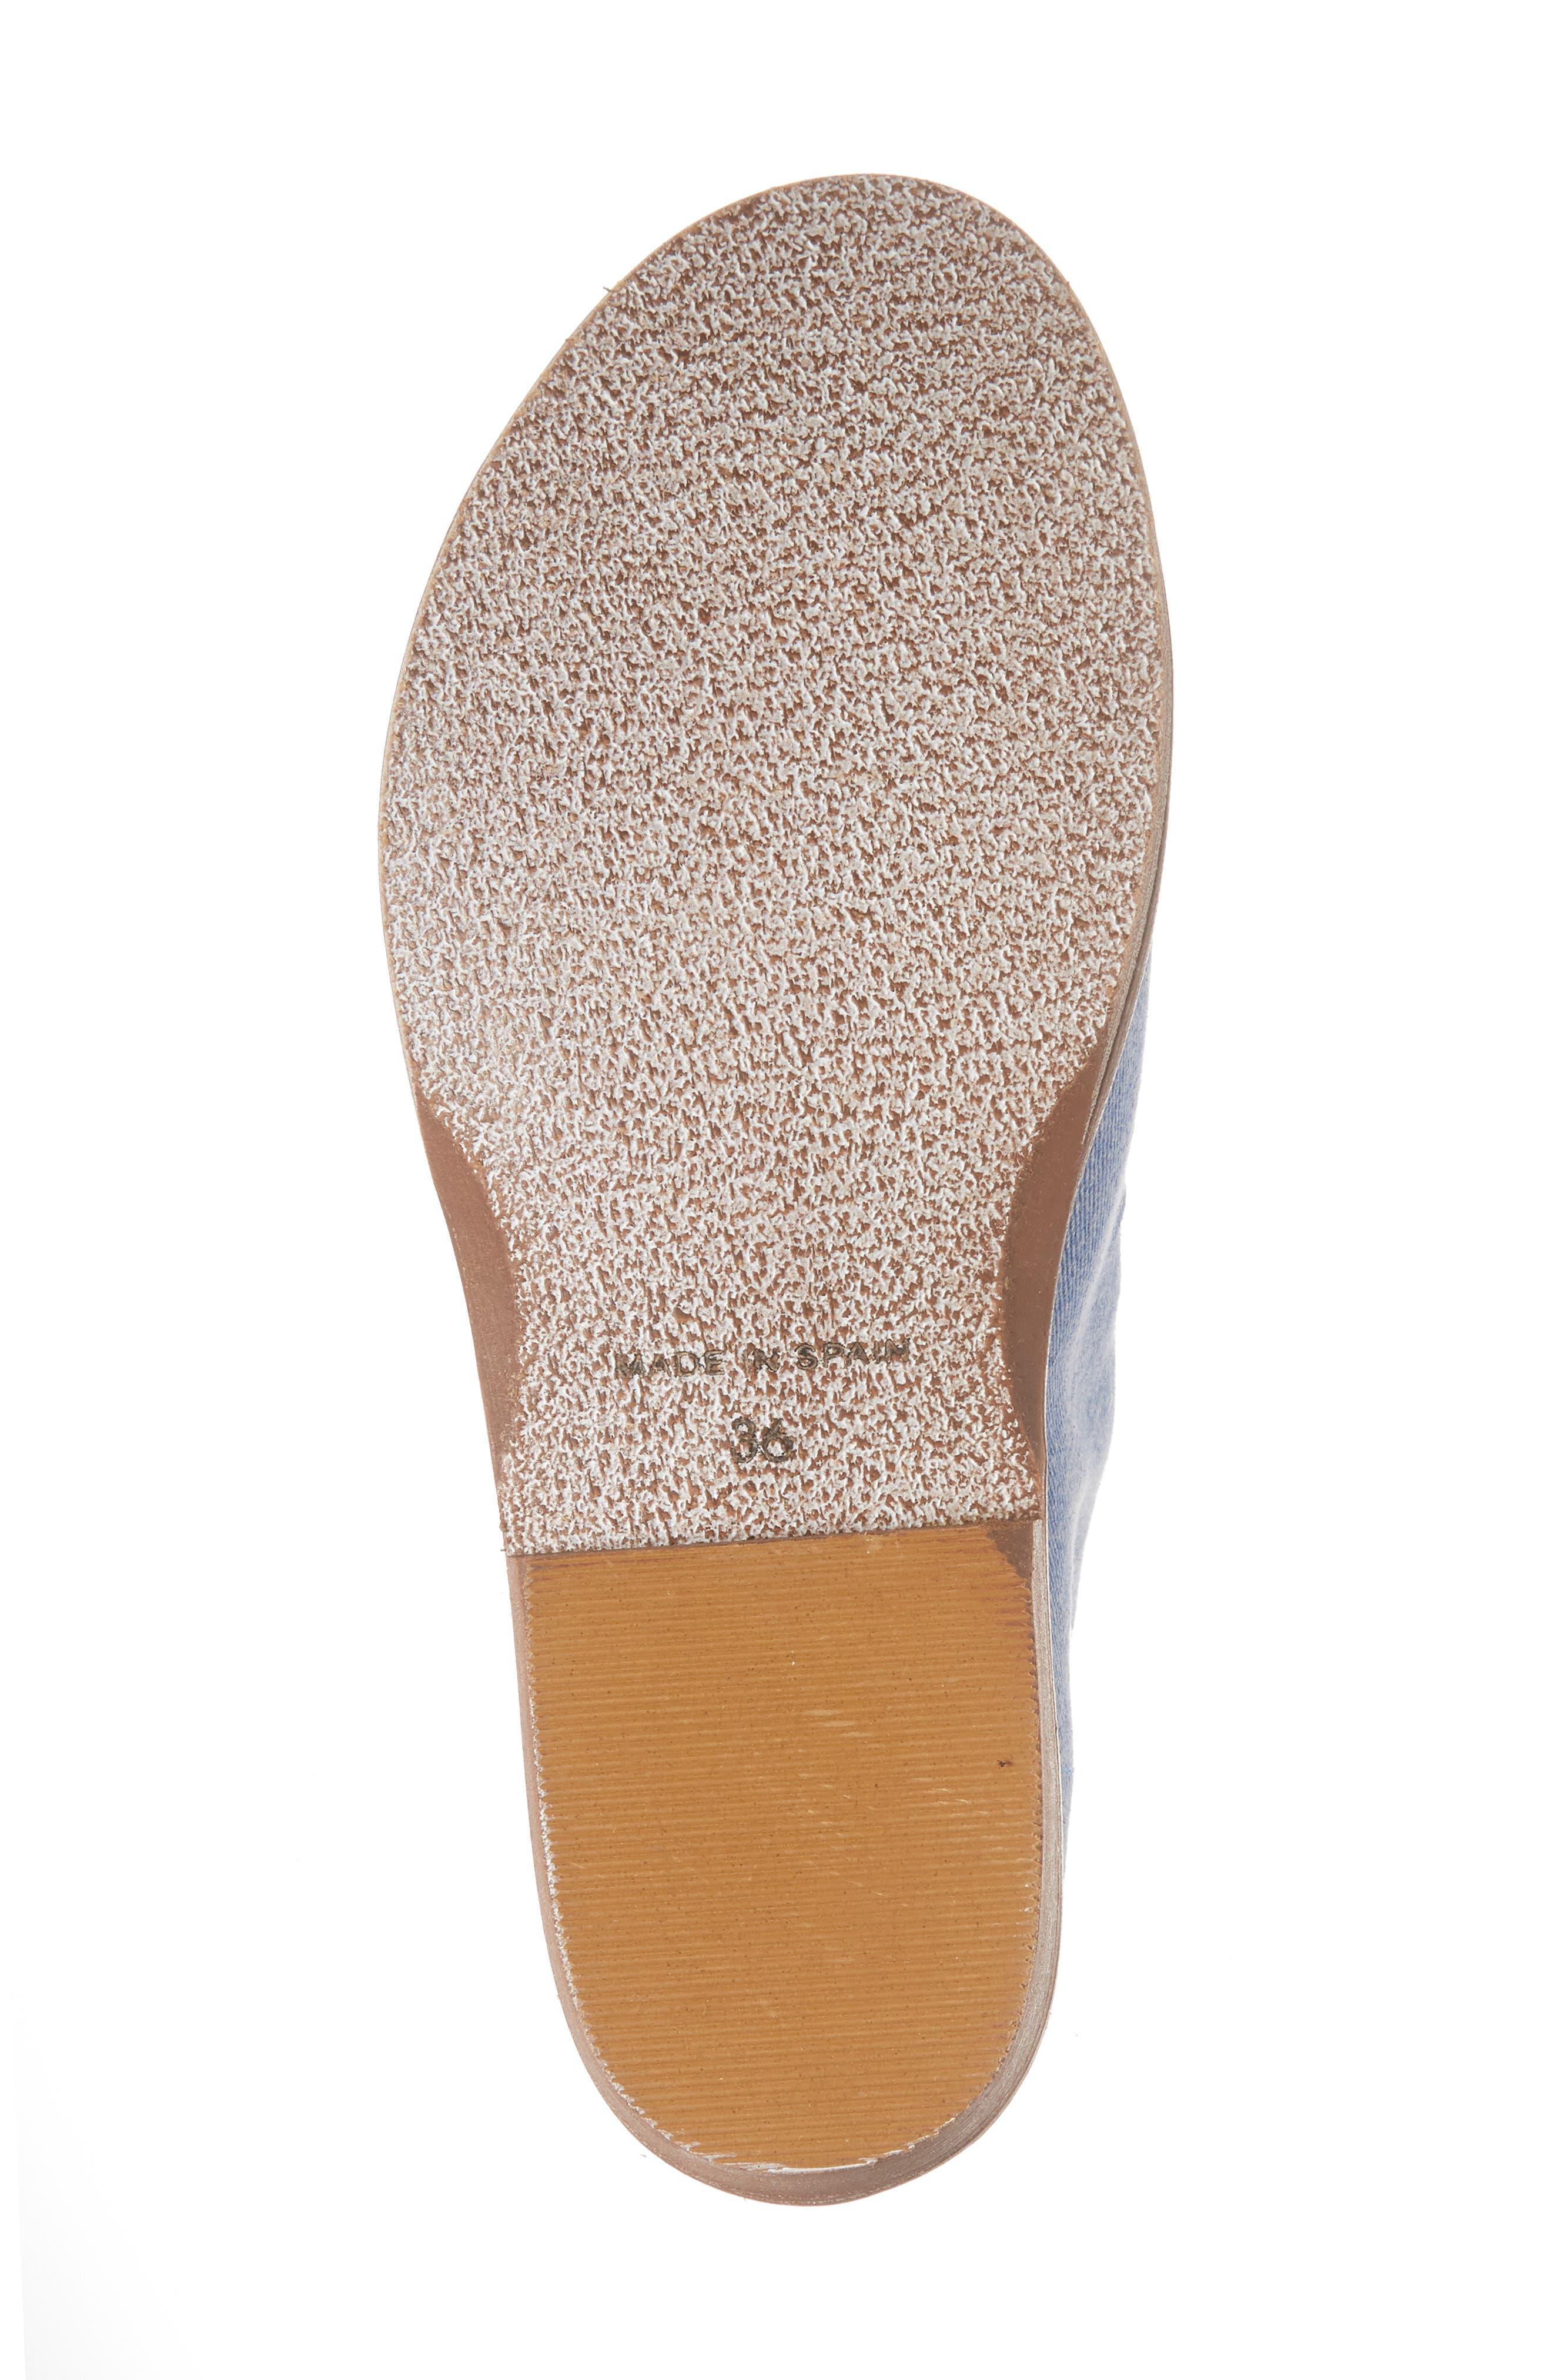 'Mont Blanc' Asymmetrical Sandal,                             Alternate thumbnail 68, color,